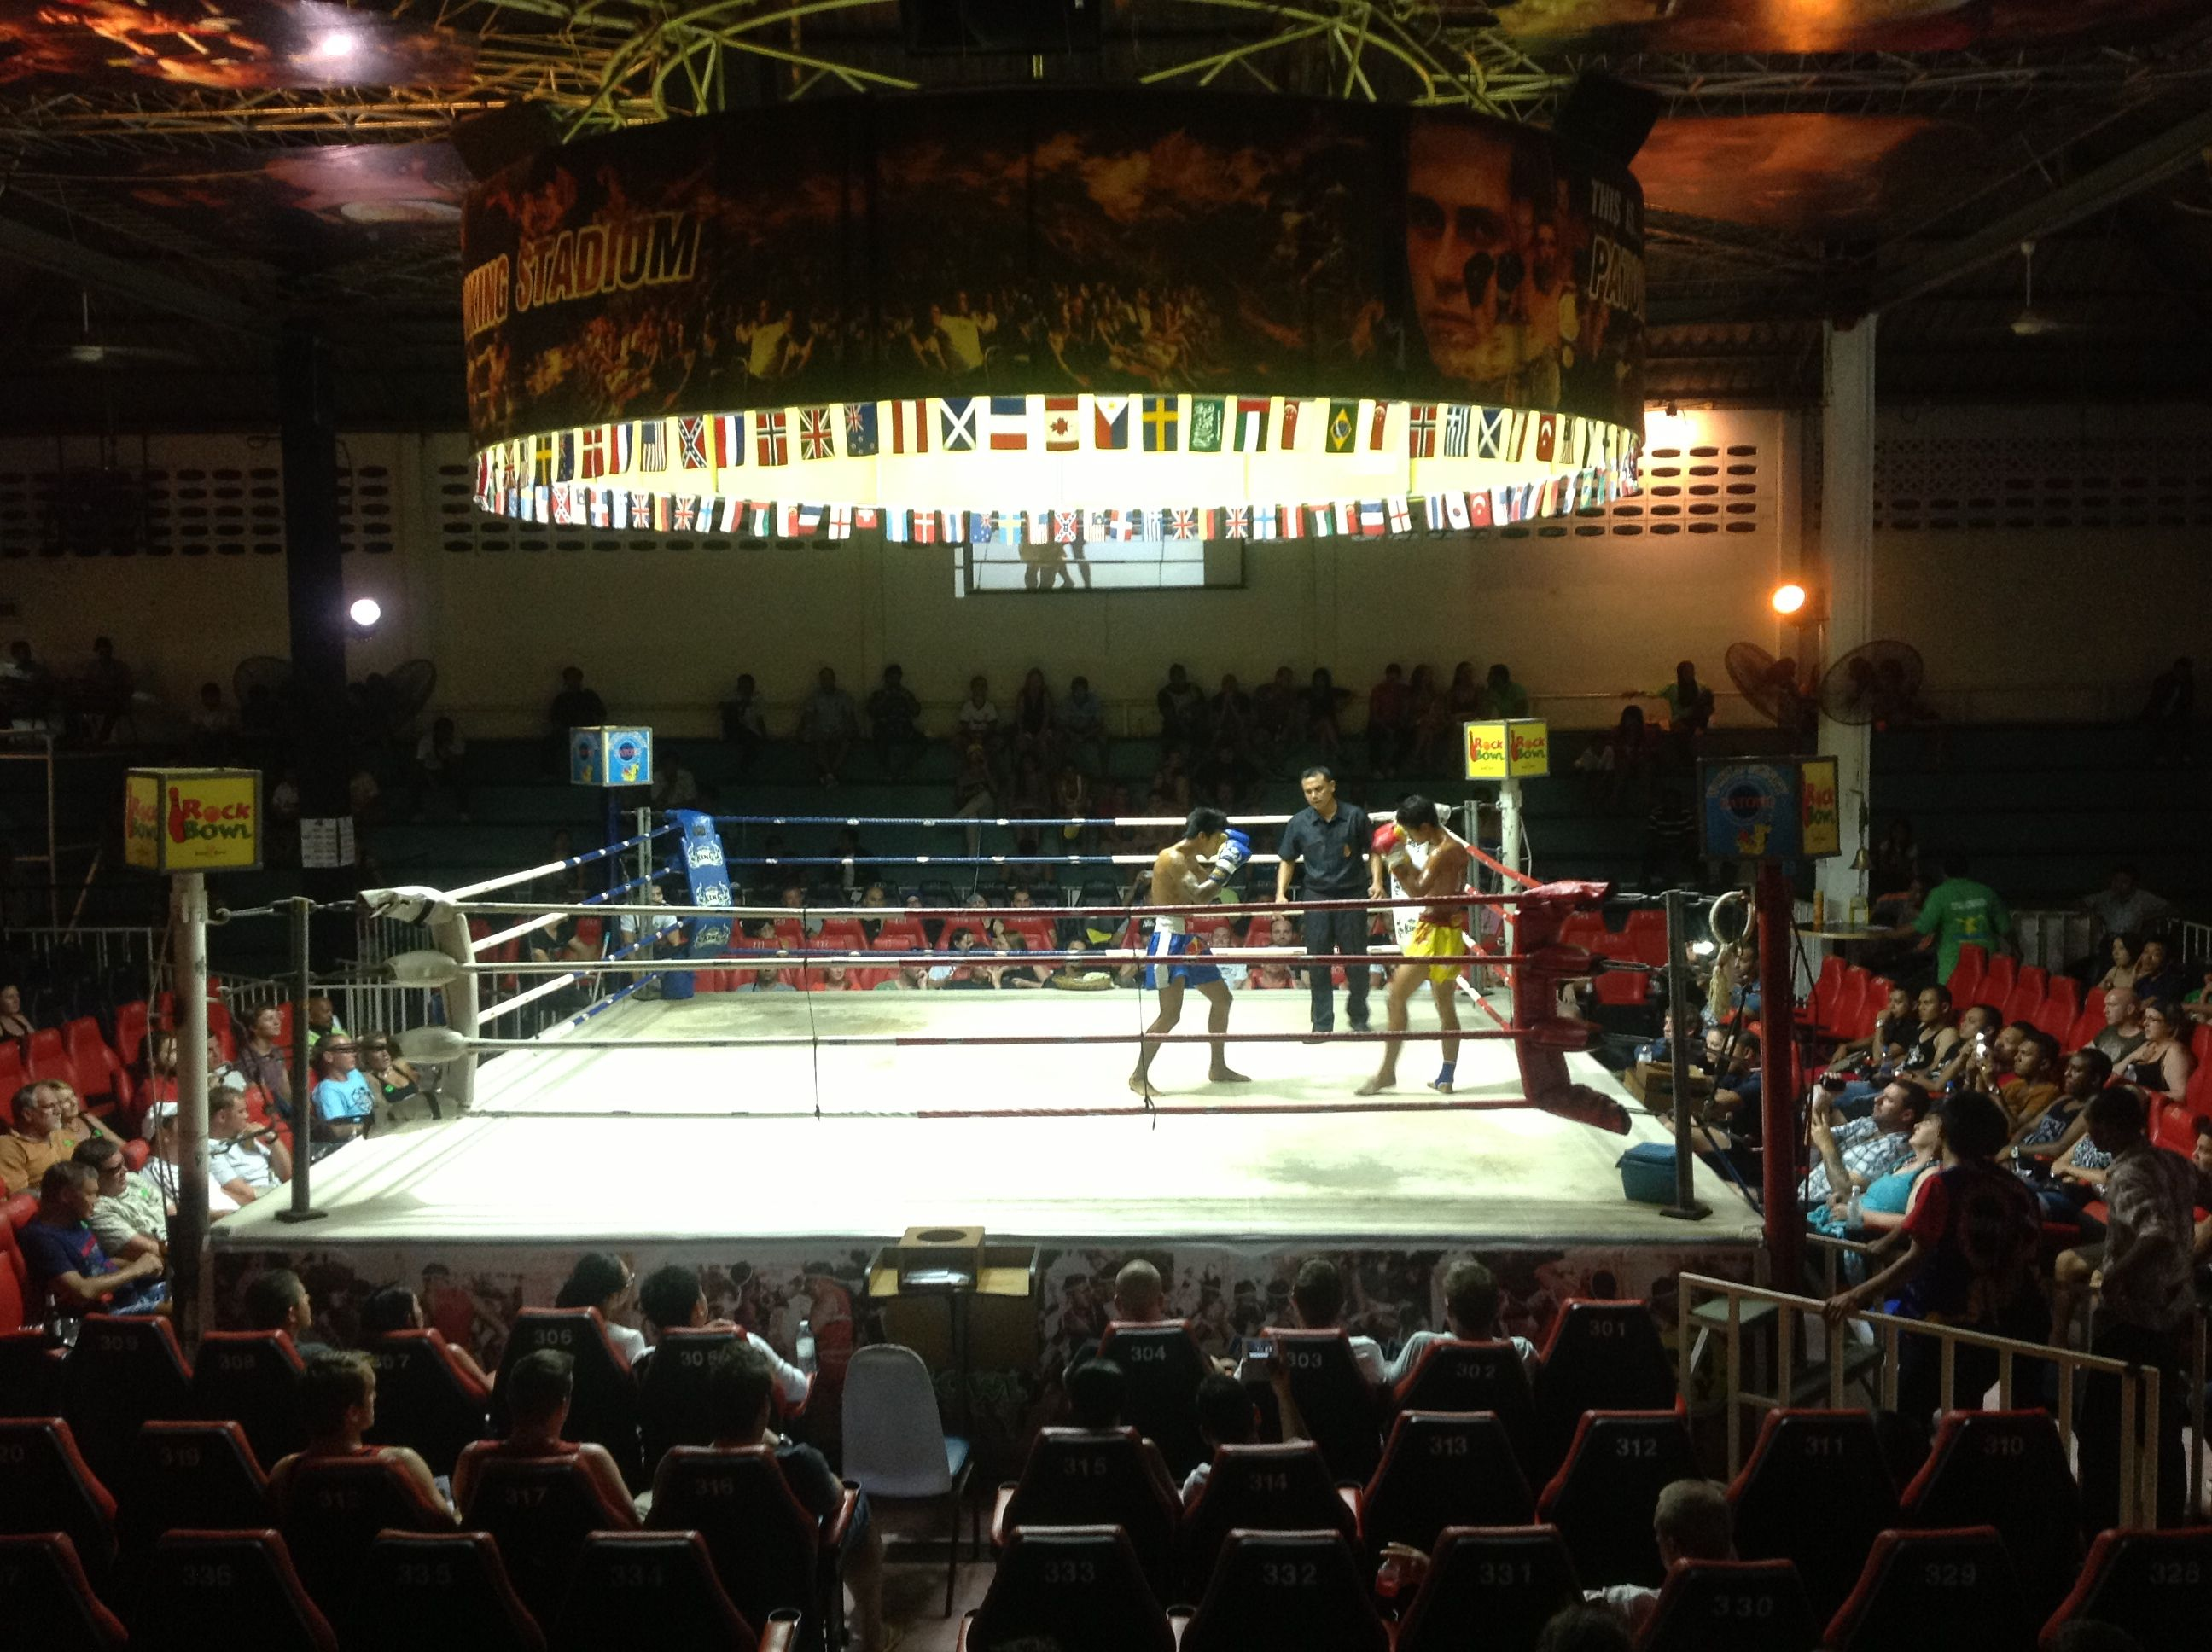 Patong Boxing Stadium Must See In Phuket Phuket Travel Phuket Thailand Vacation